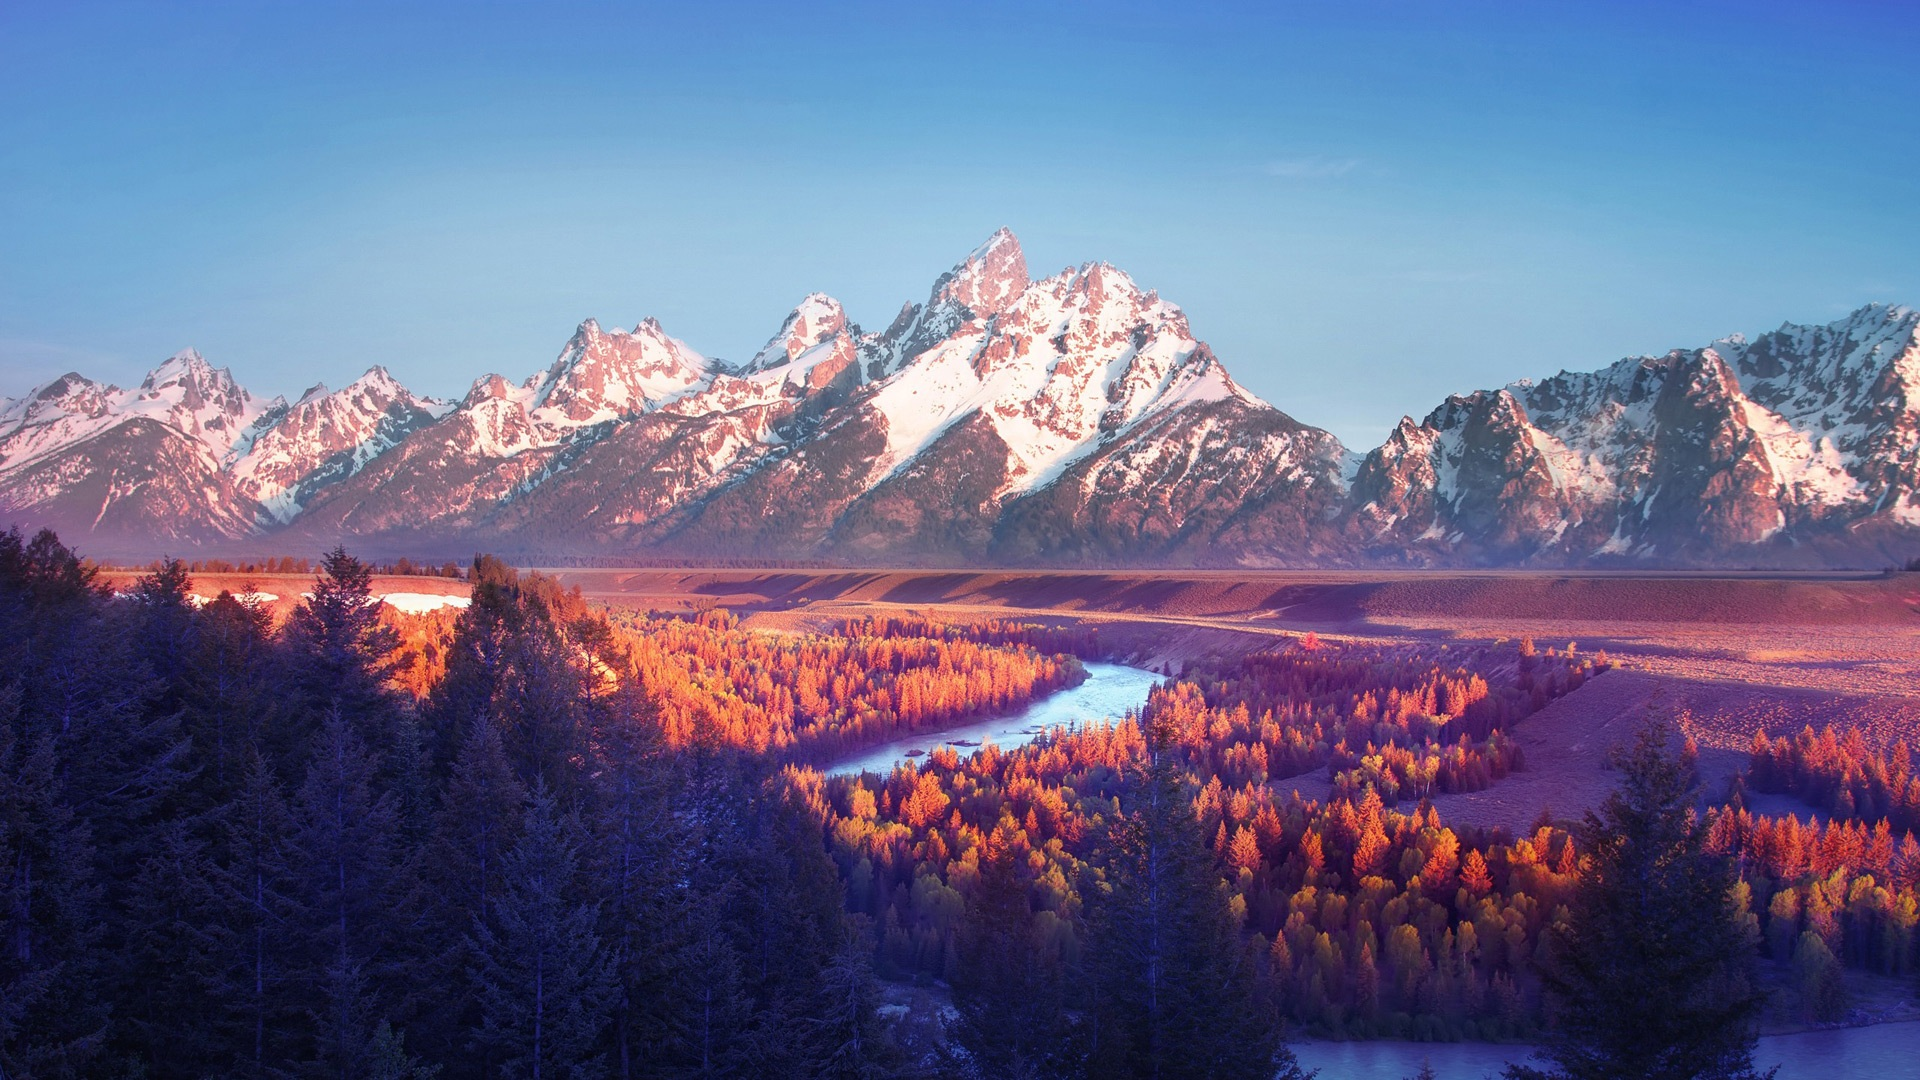 Mountain Wallpaper Mountain Full High Definition Quality 1920x1080